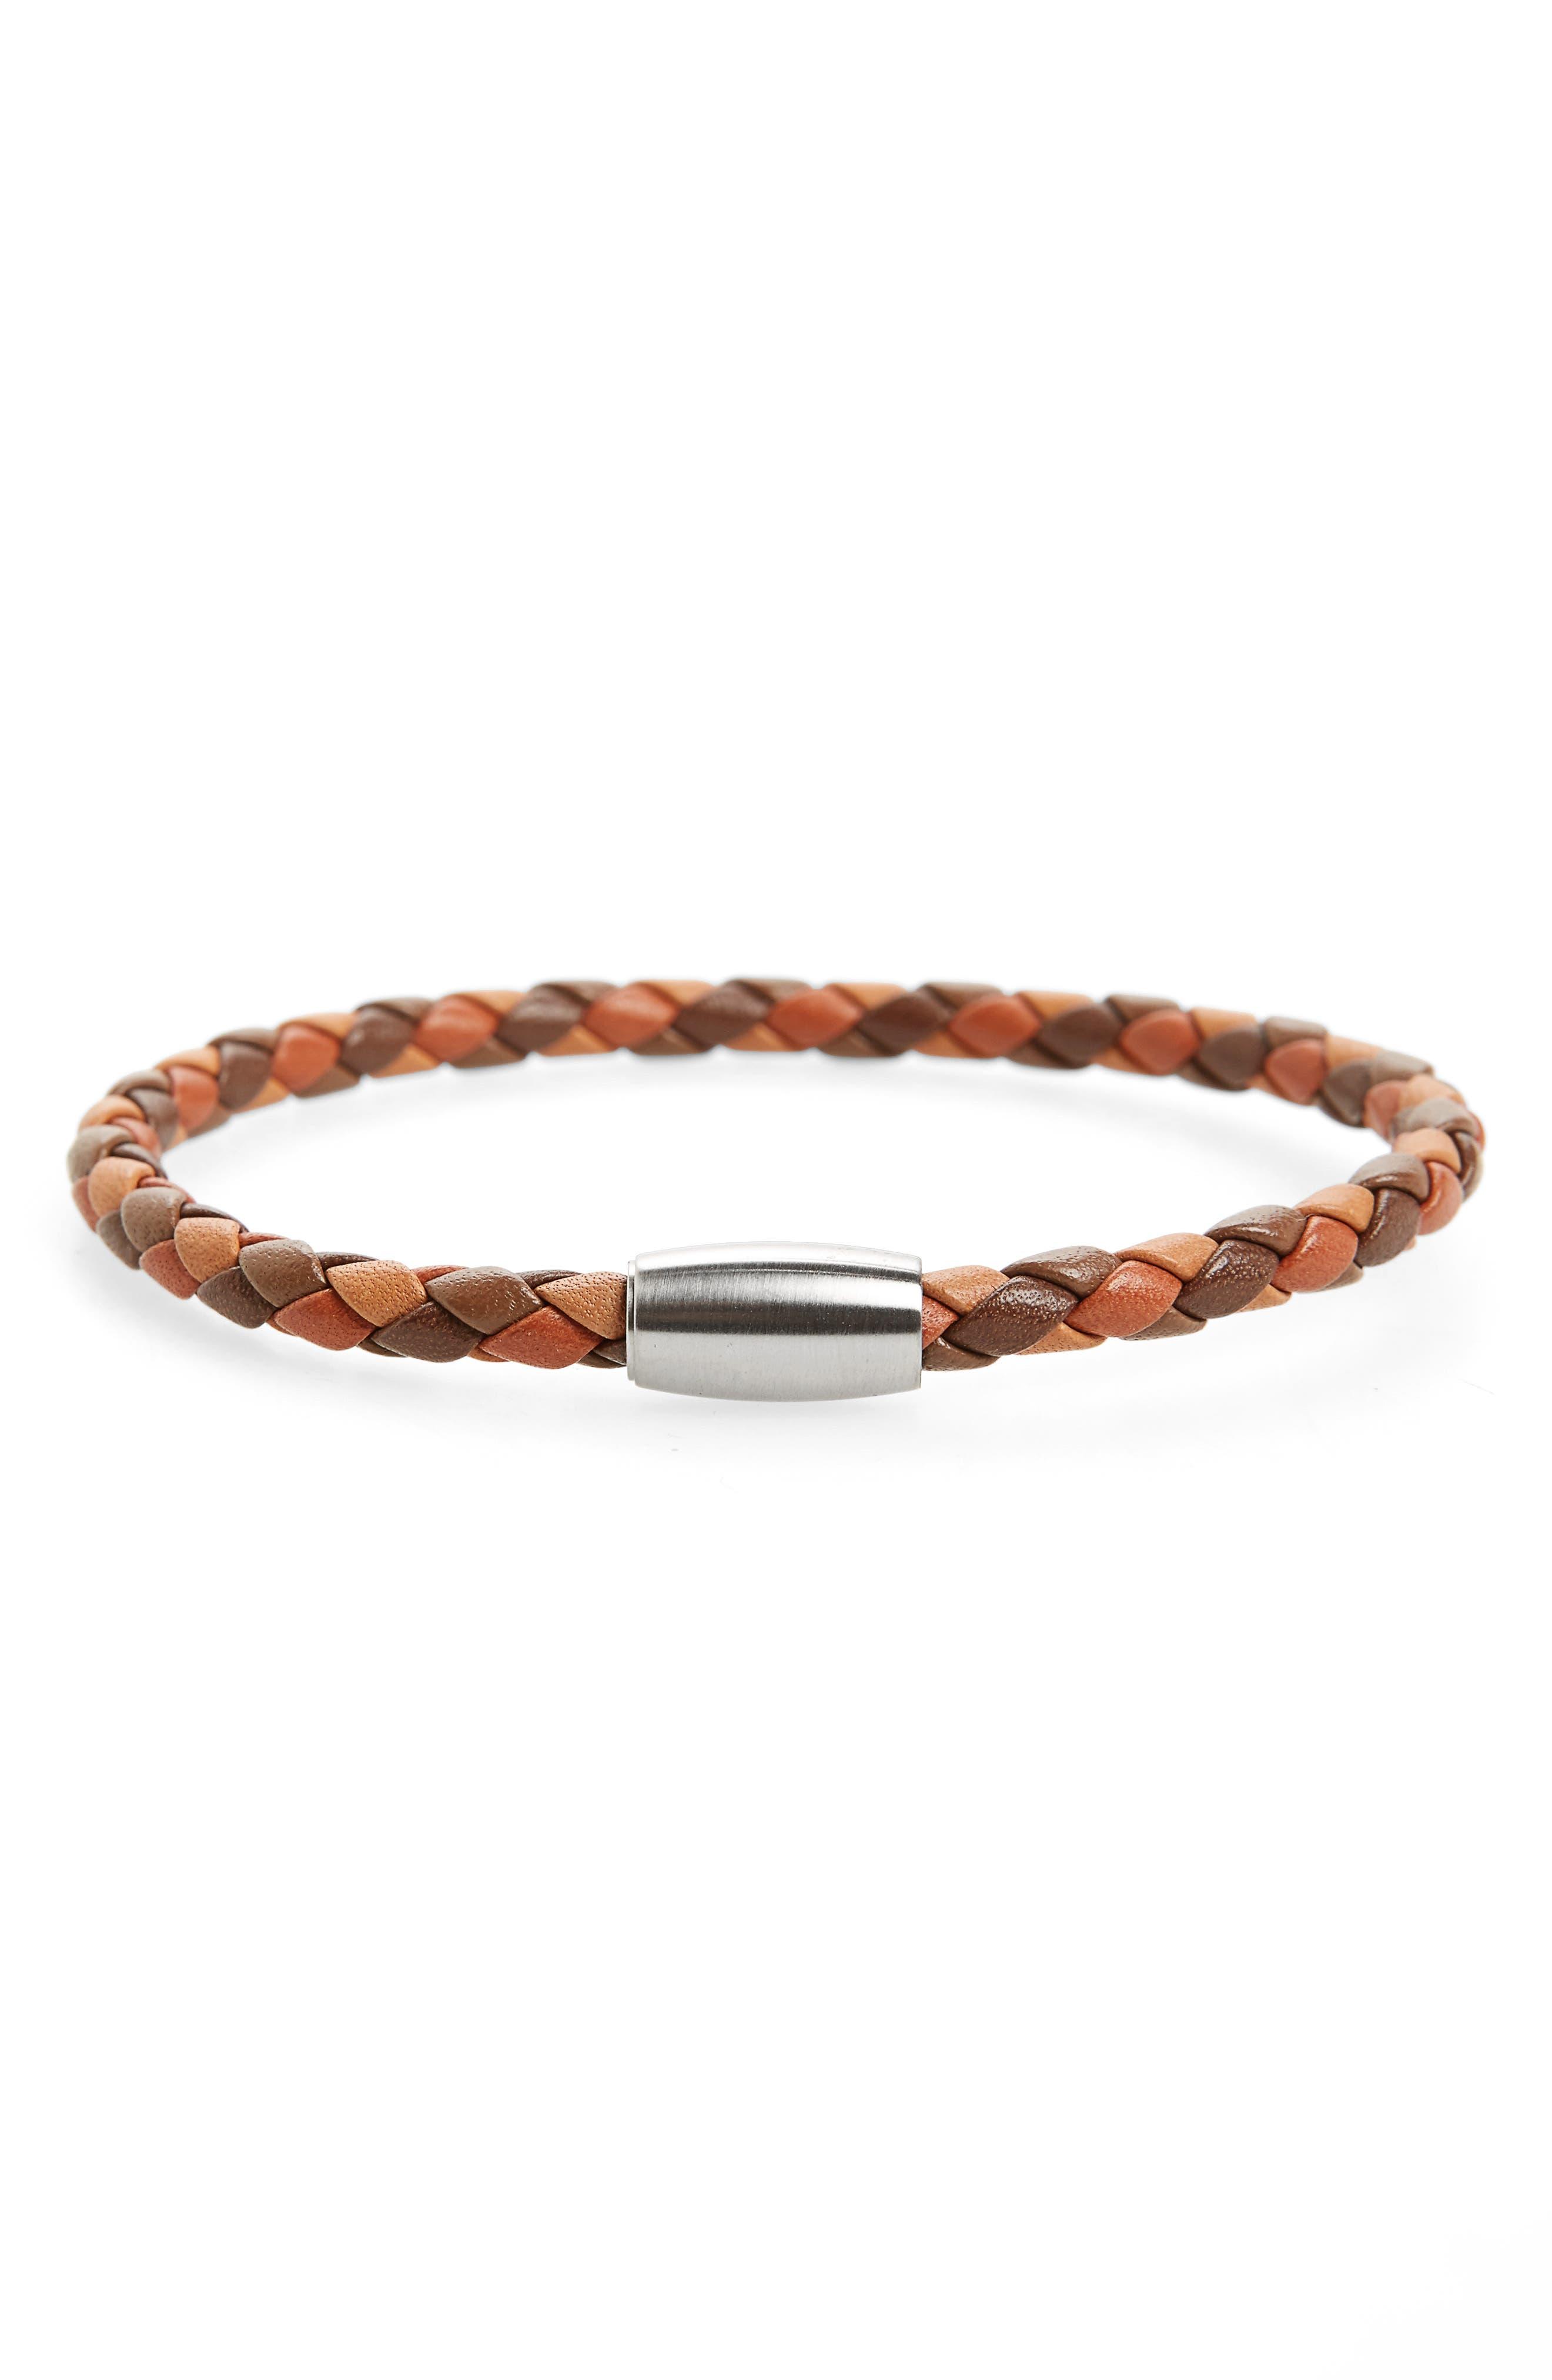 LINK UP Woven Leather Bracelet